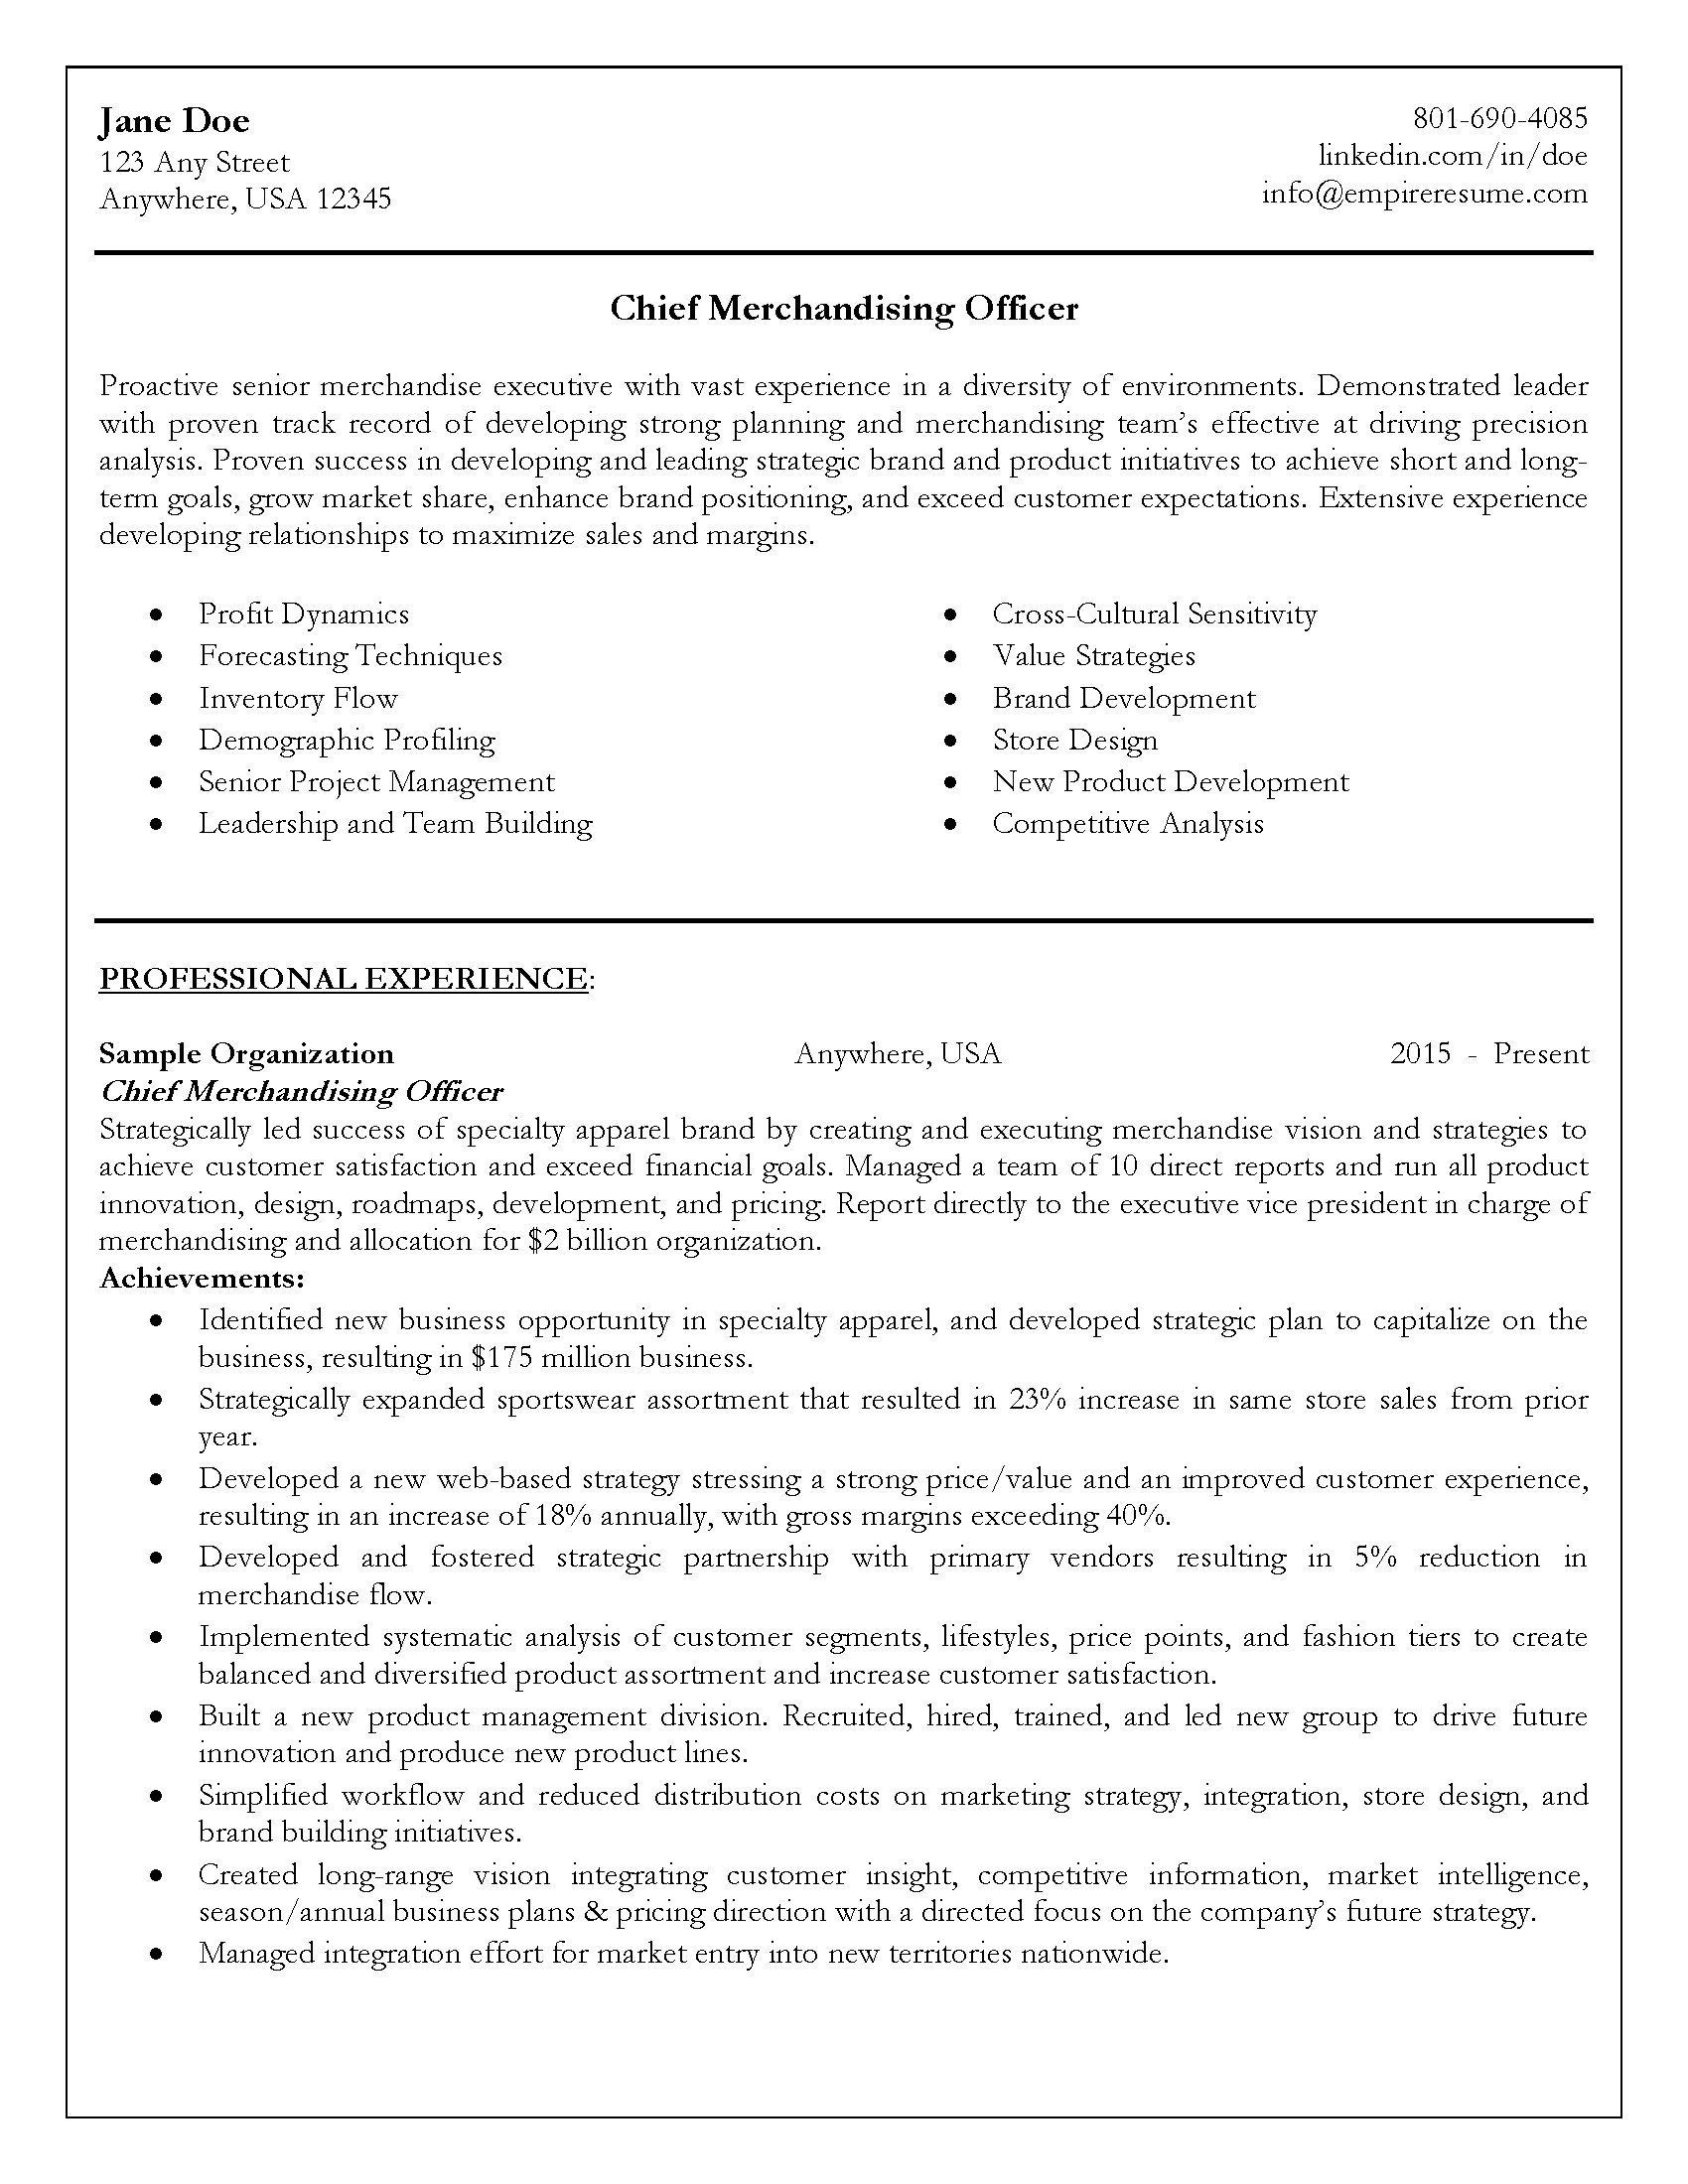 Professional Resume Examples Salt Lake City